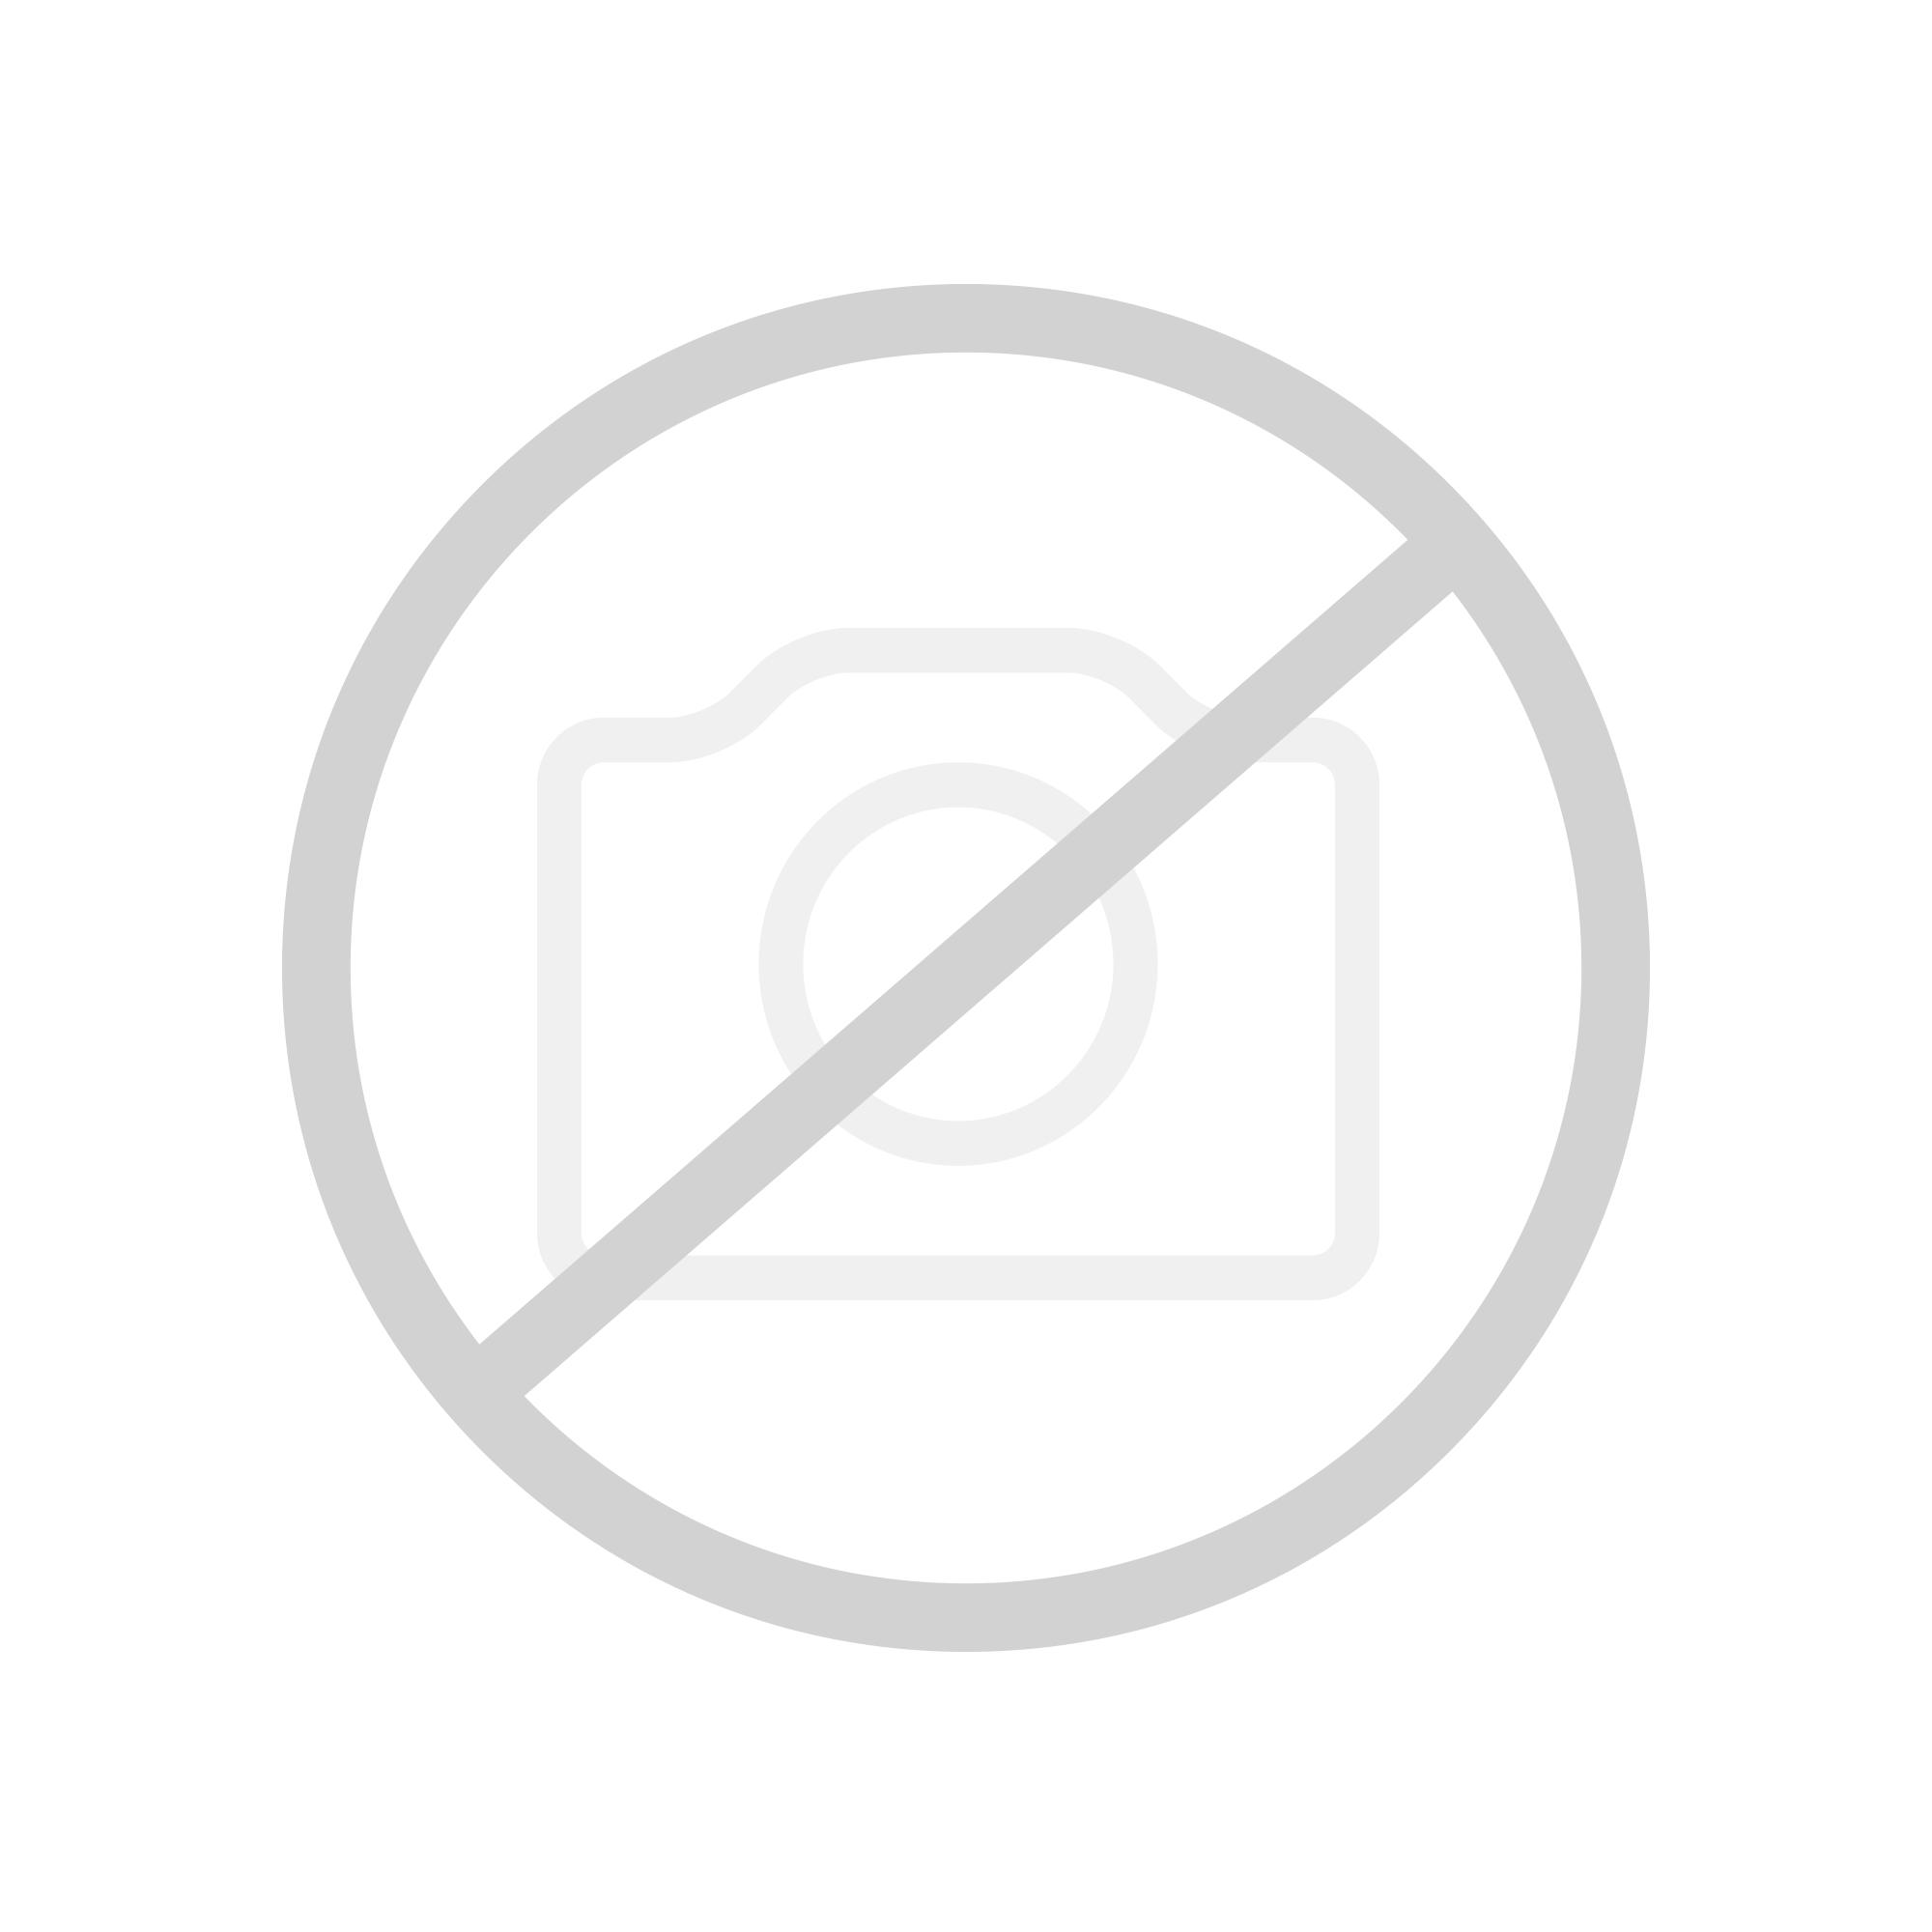 hansgrohe ecostat e thermostat unterputz f r 1 verbraucher 15707000 reuter onlineshop. Black Bedroom Furniture Sets. Home Design Ideas